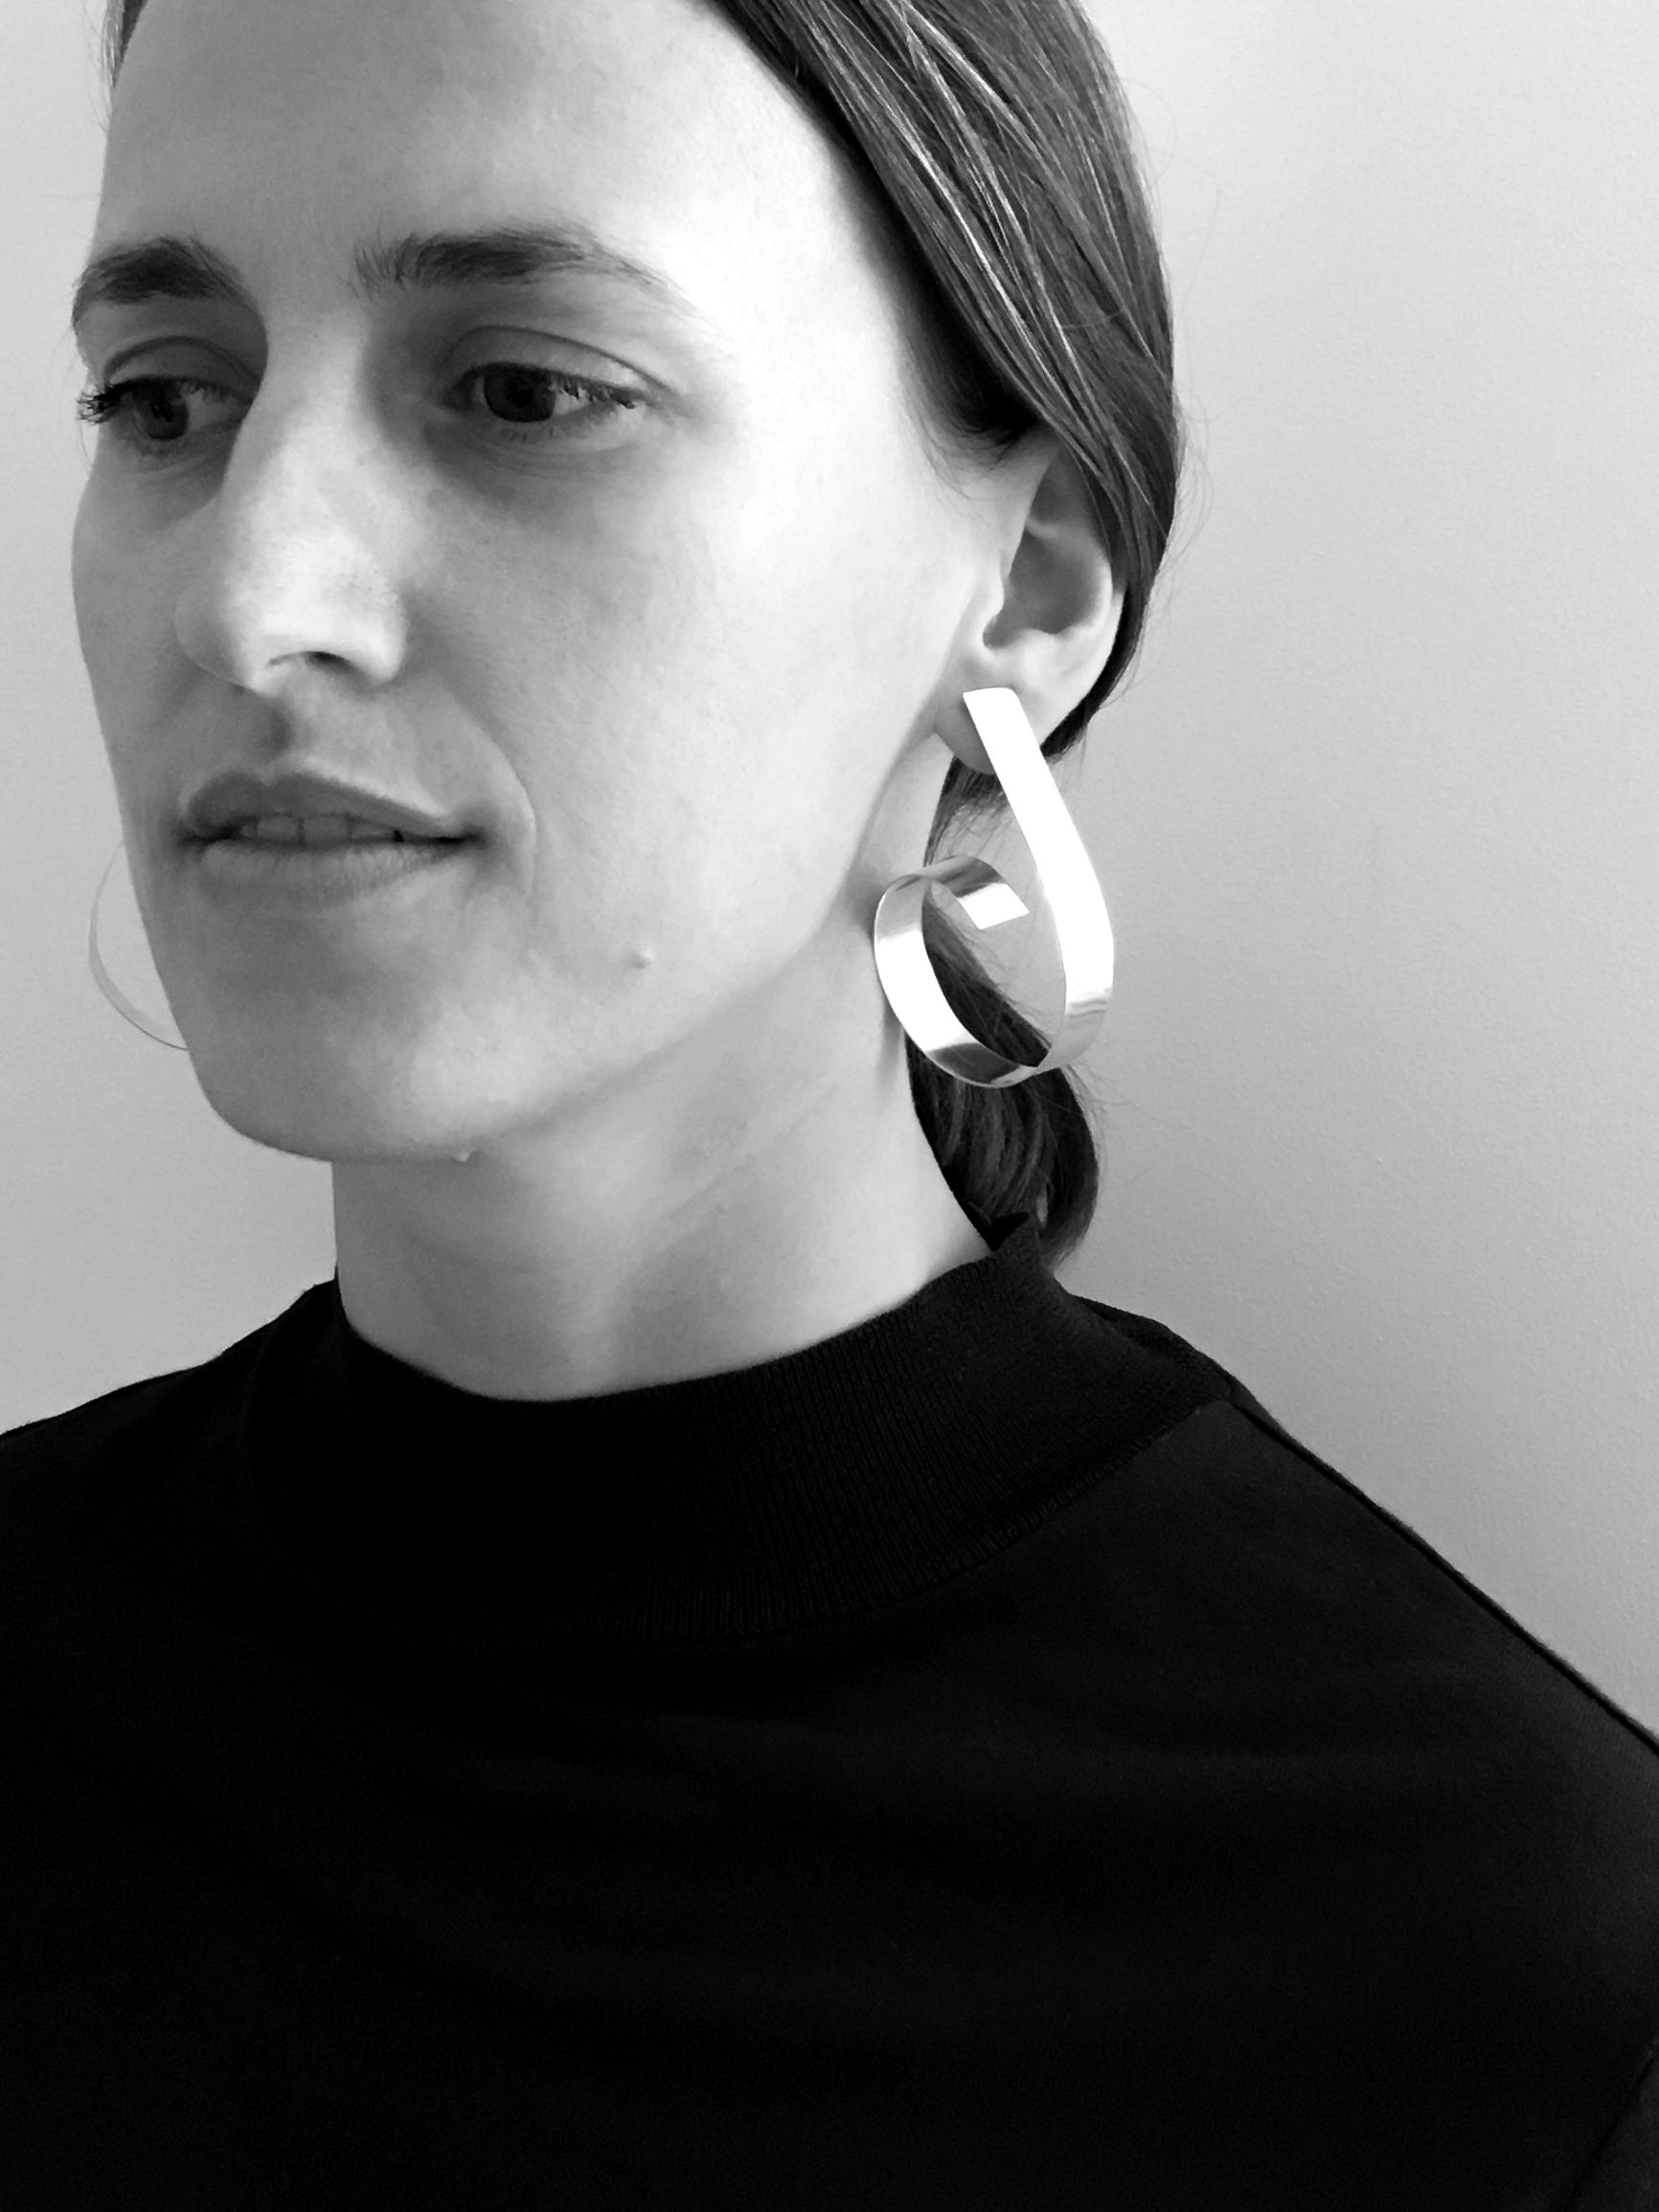 LOOPING earring by Sara Robertsson on Fatima 01.jpg